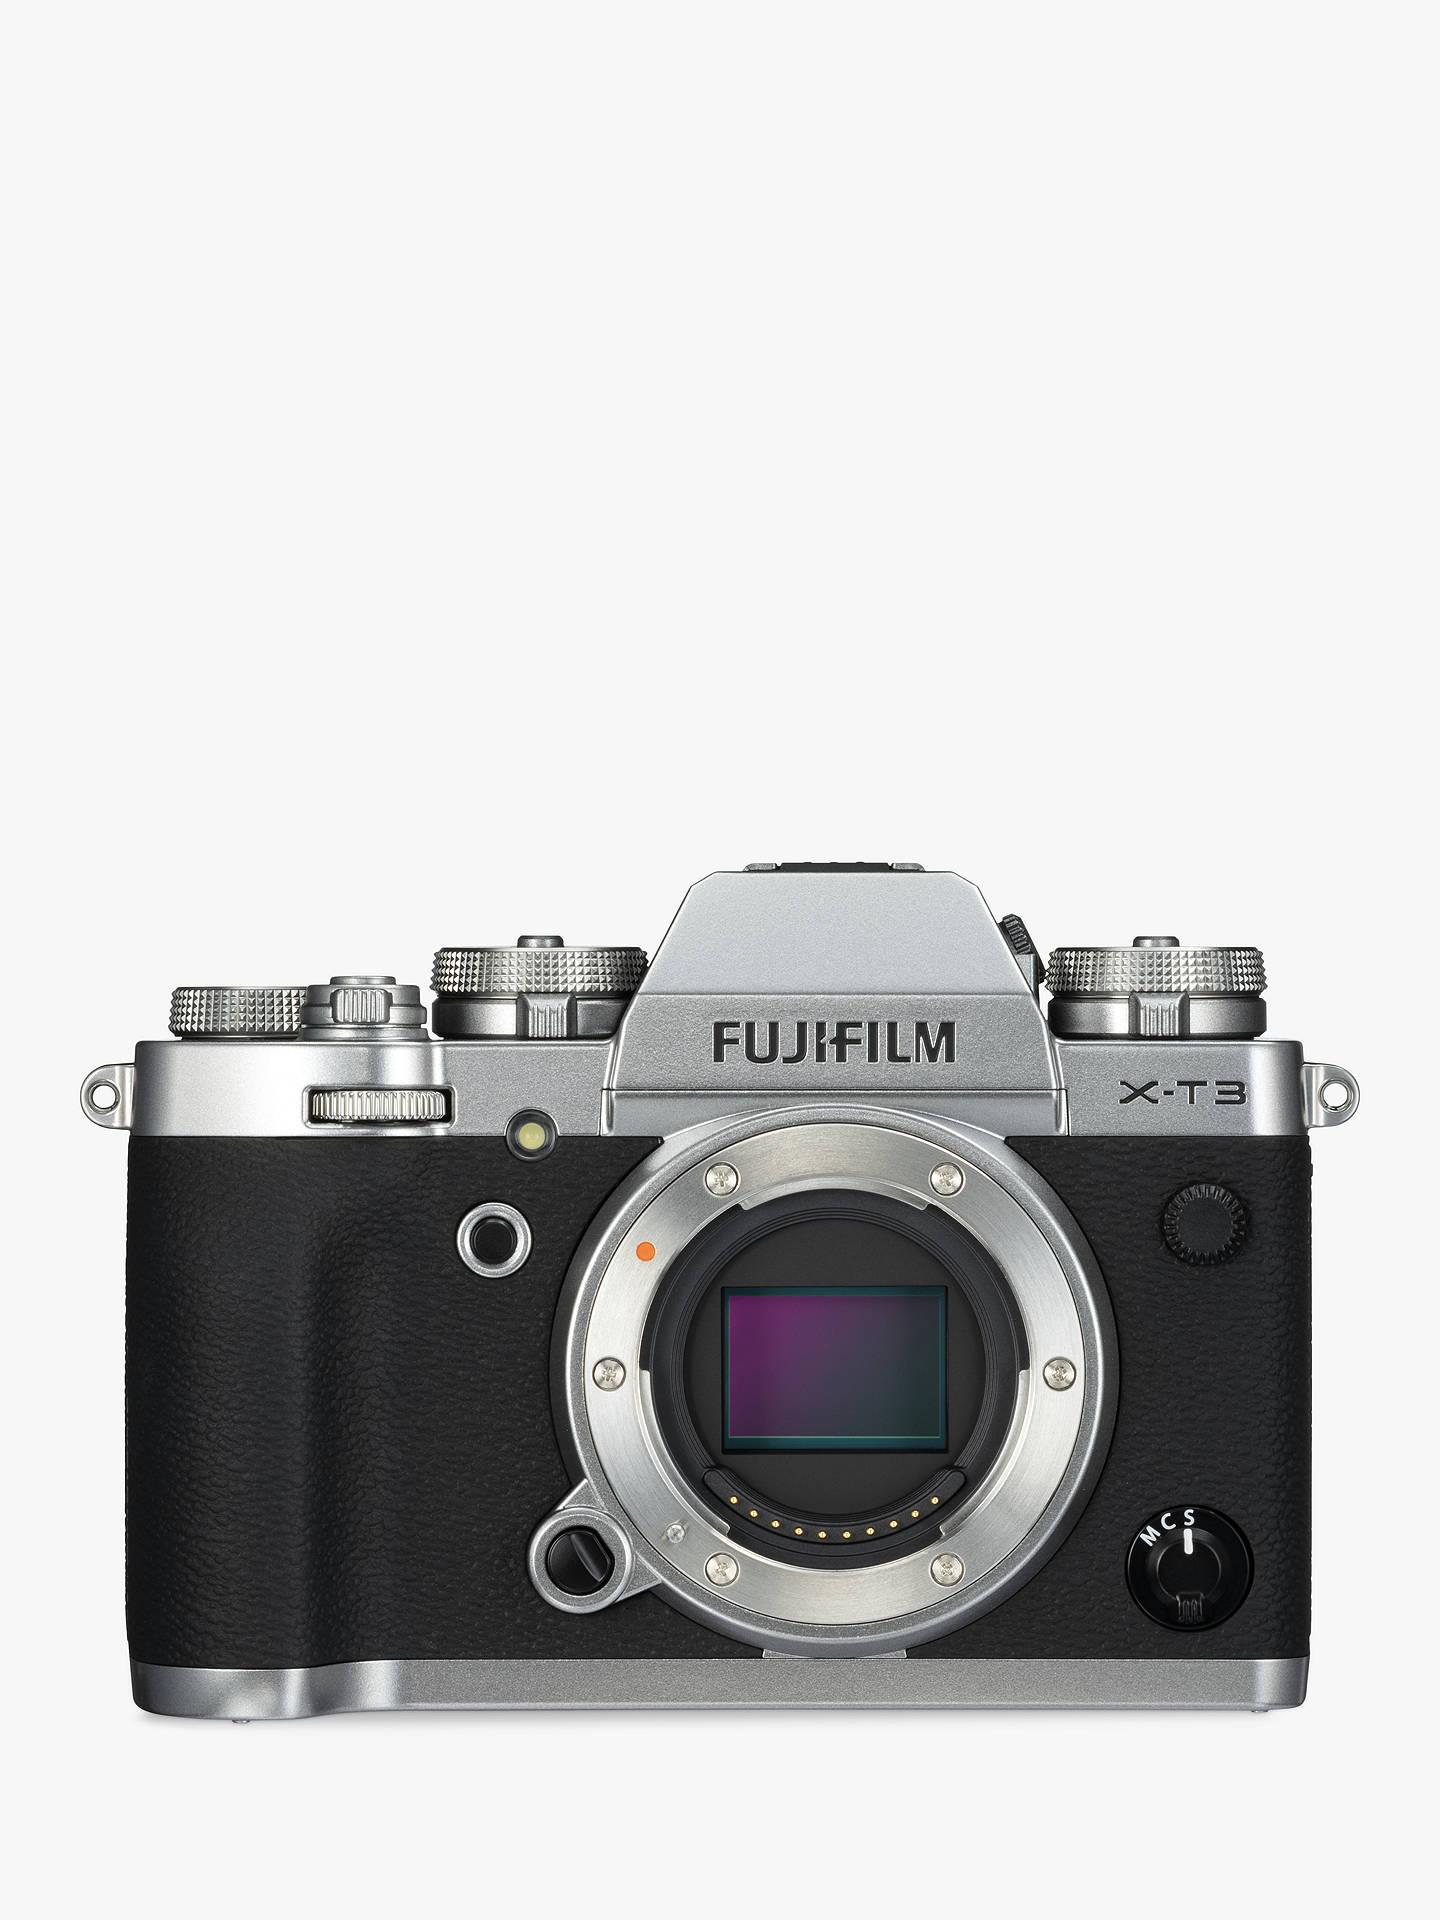 Fujifilm X-T3 Body Only £899 @ John Lewis & Partners